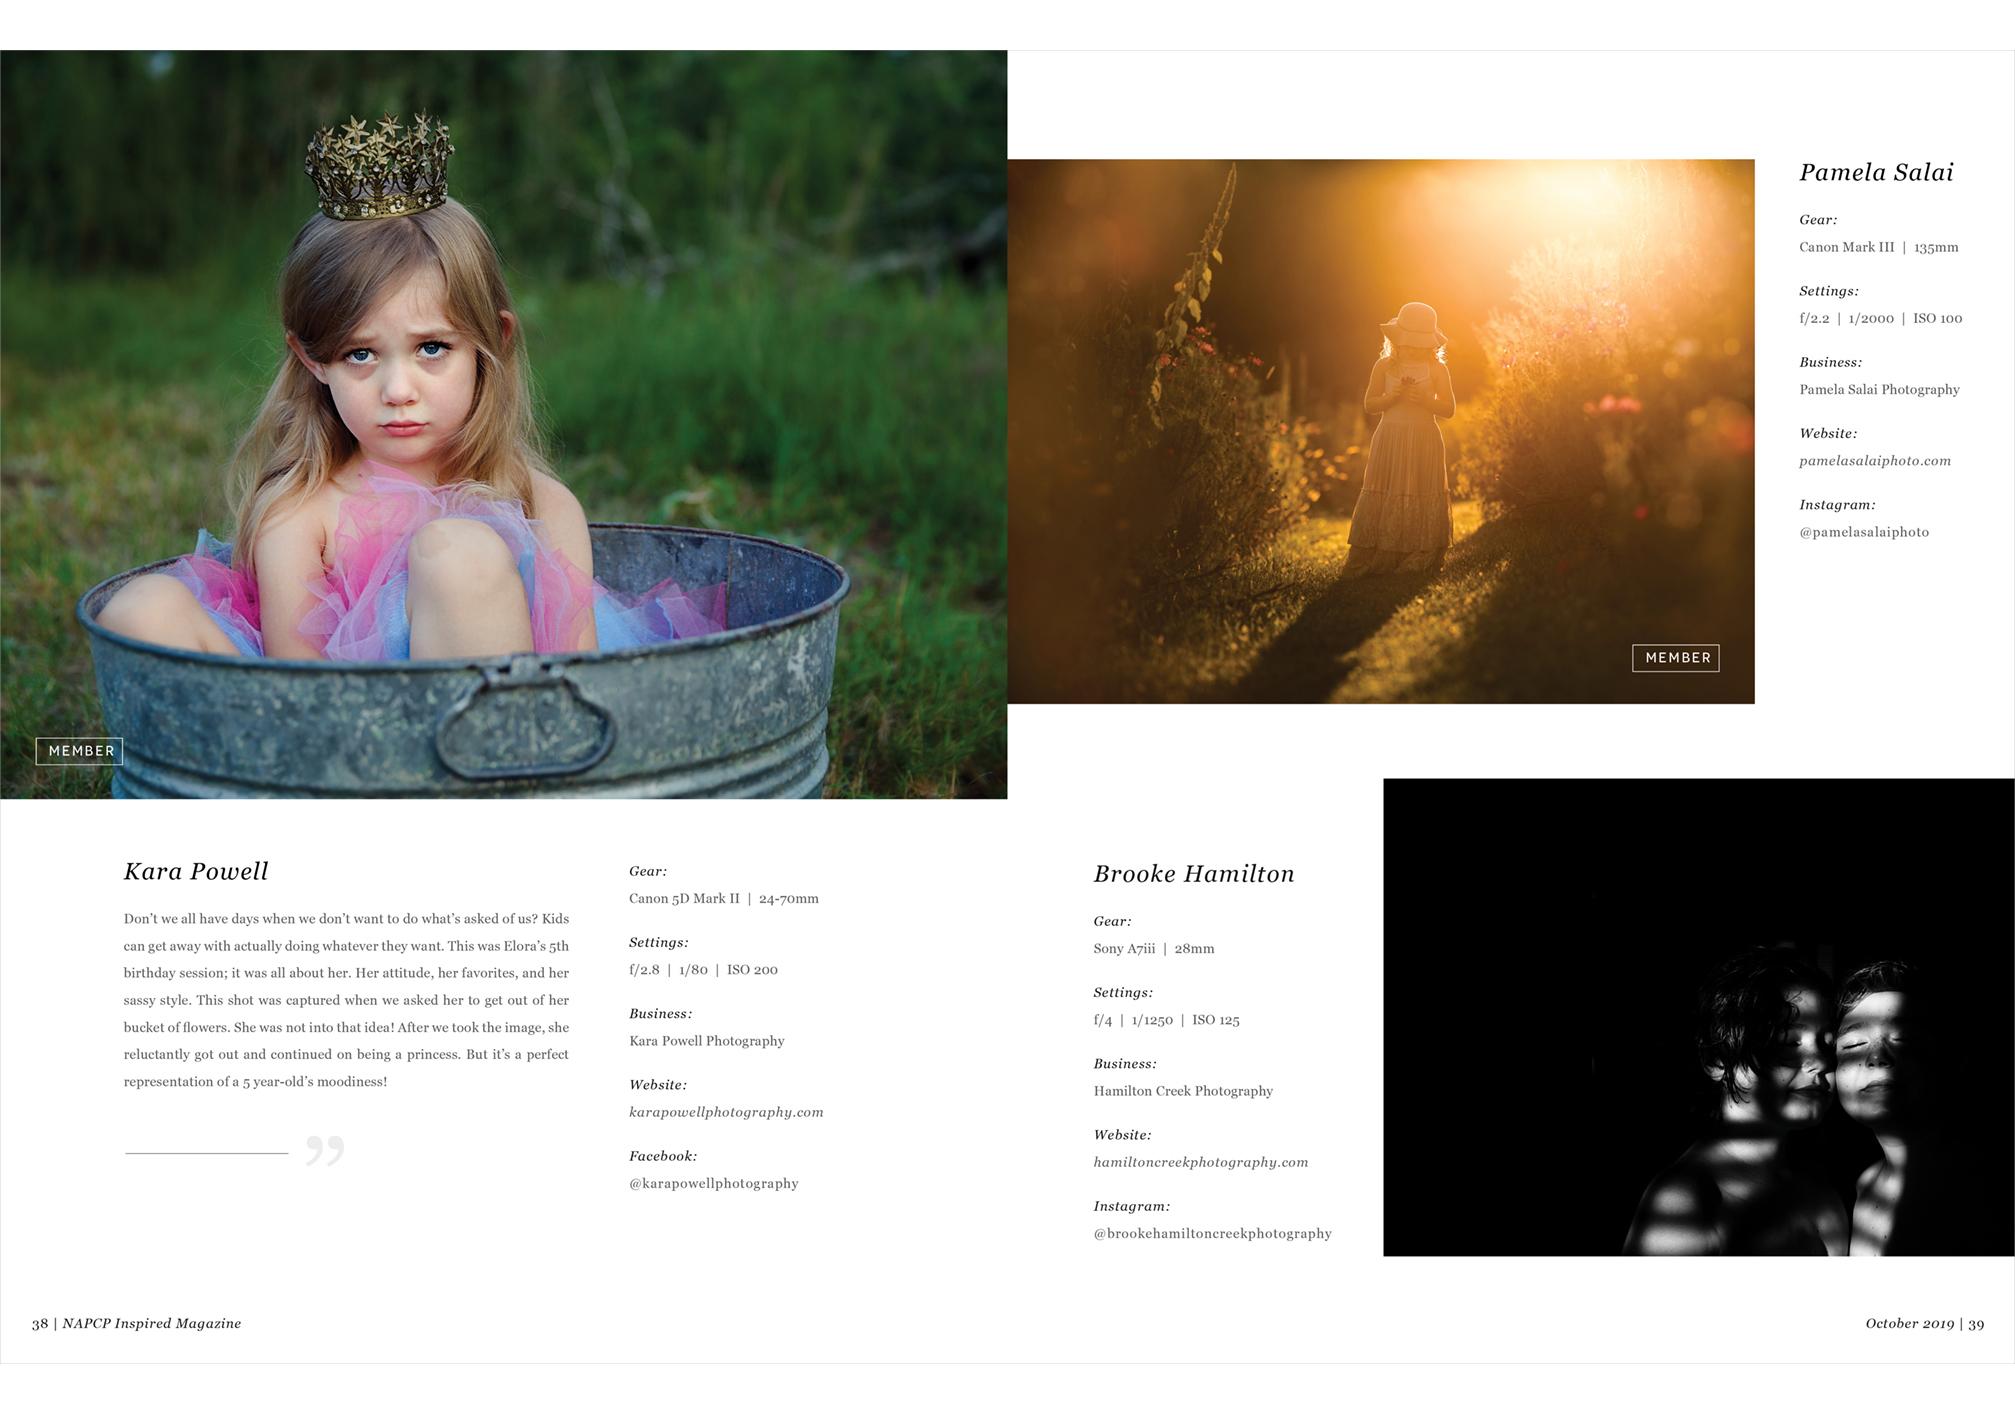 NAPCP Inspired Magazine, October 2019, Kara Powell, Pamela Salai, Brooke Hamilton